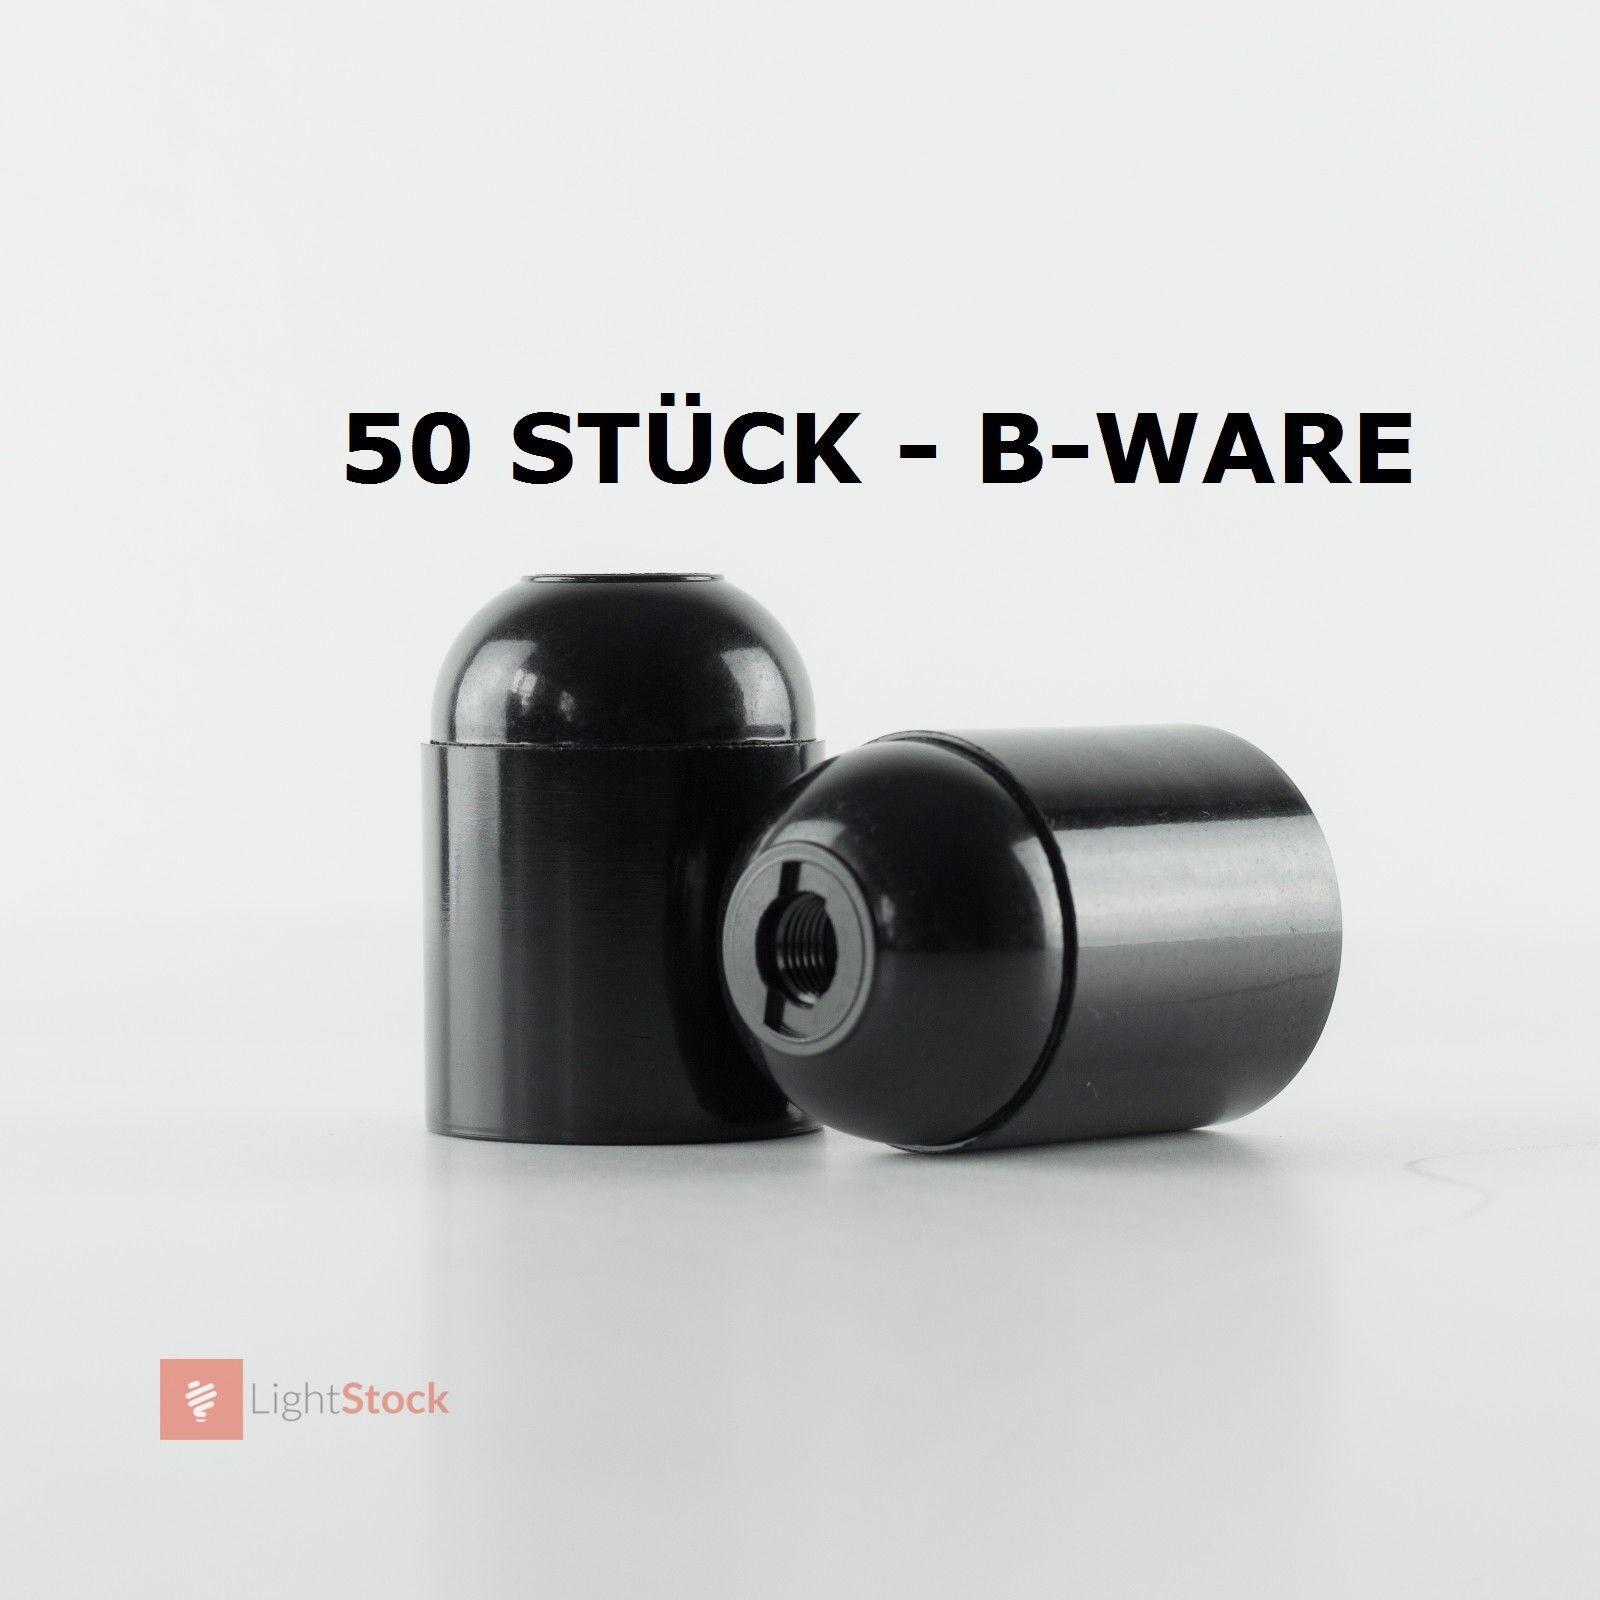 50 unidades-B-Ware art-deco, vintage estilo versión bakelitfassung e27, negro